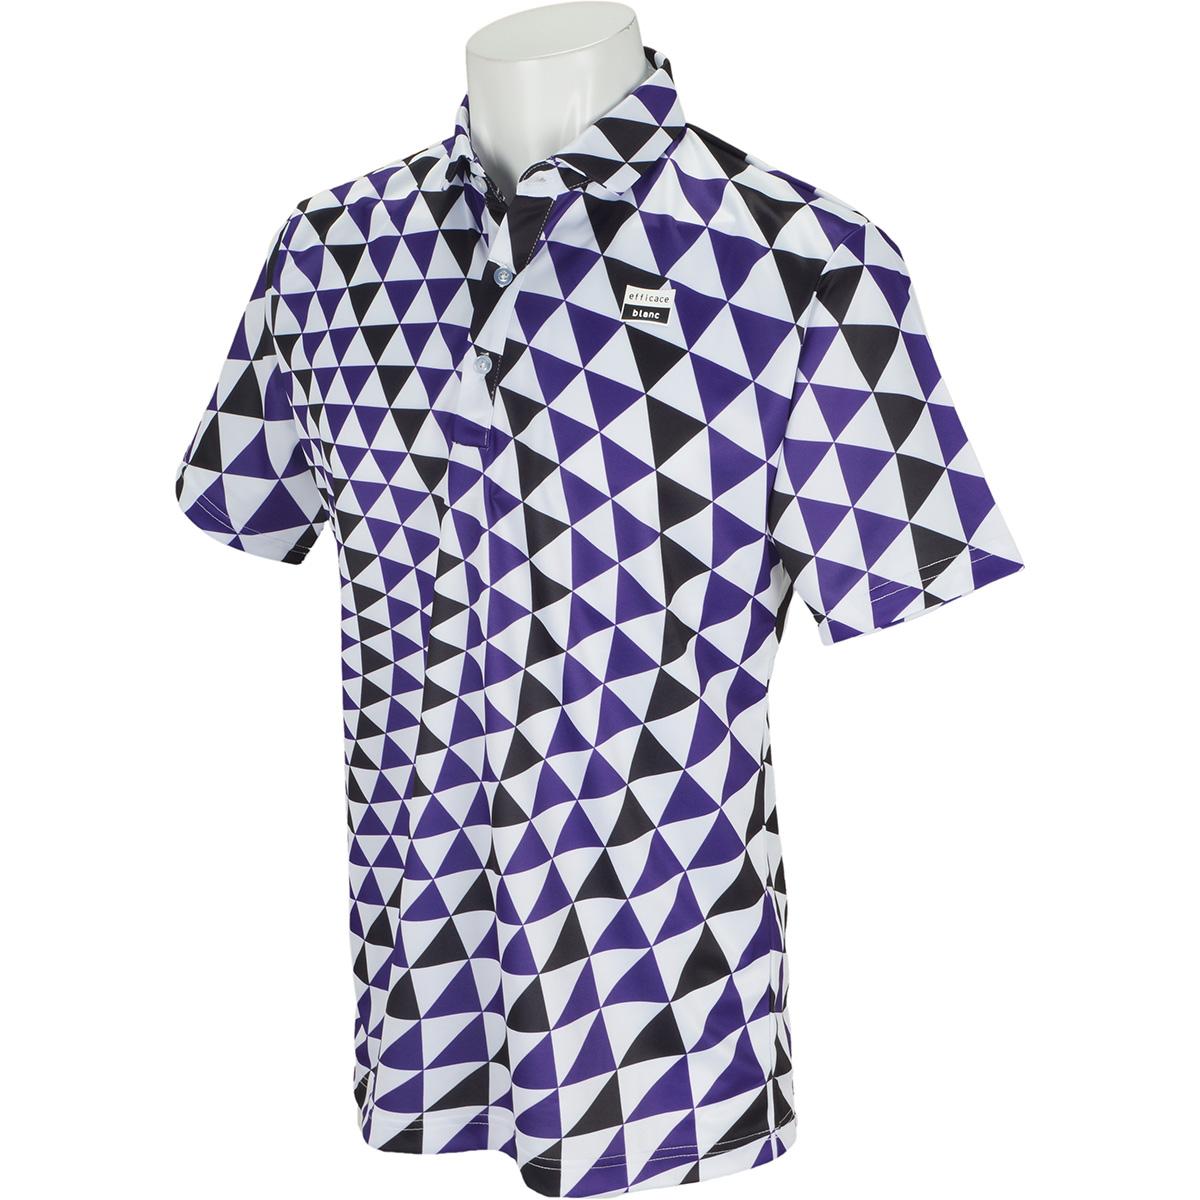 efficace blanc ストレッチ ビッグサークル柄半袖ポロシャツ